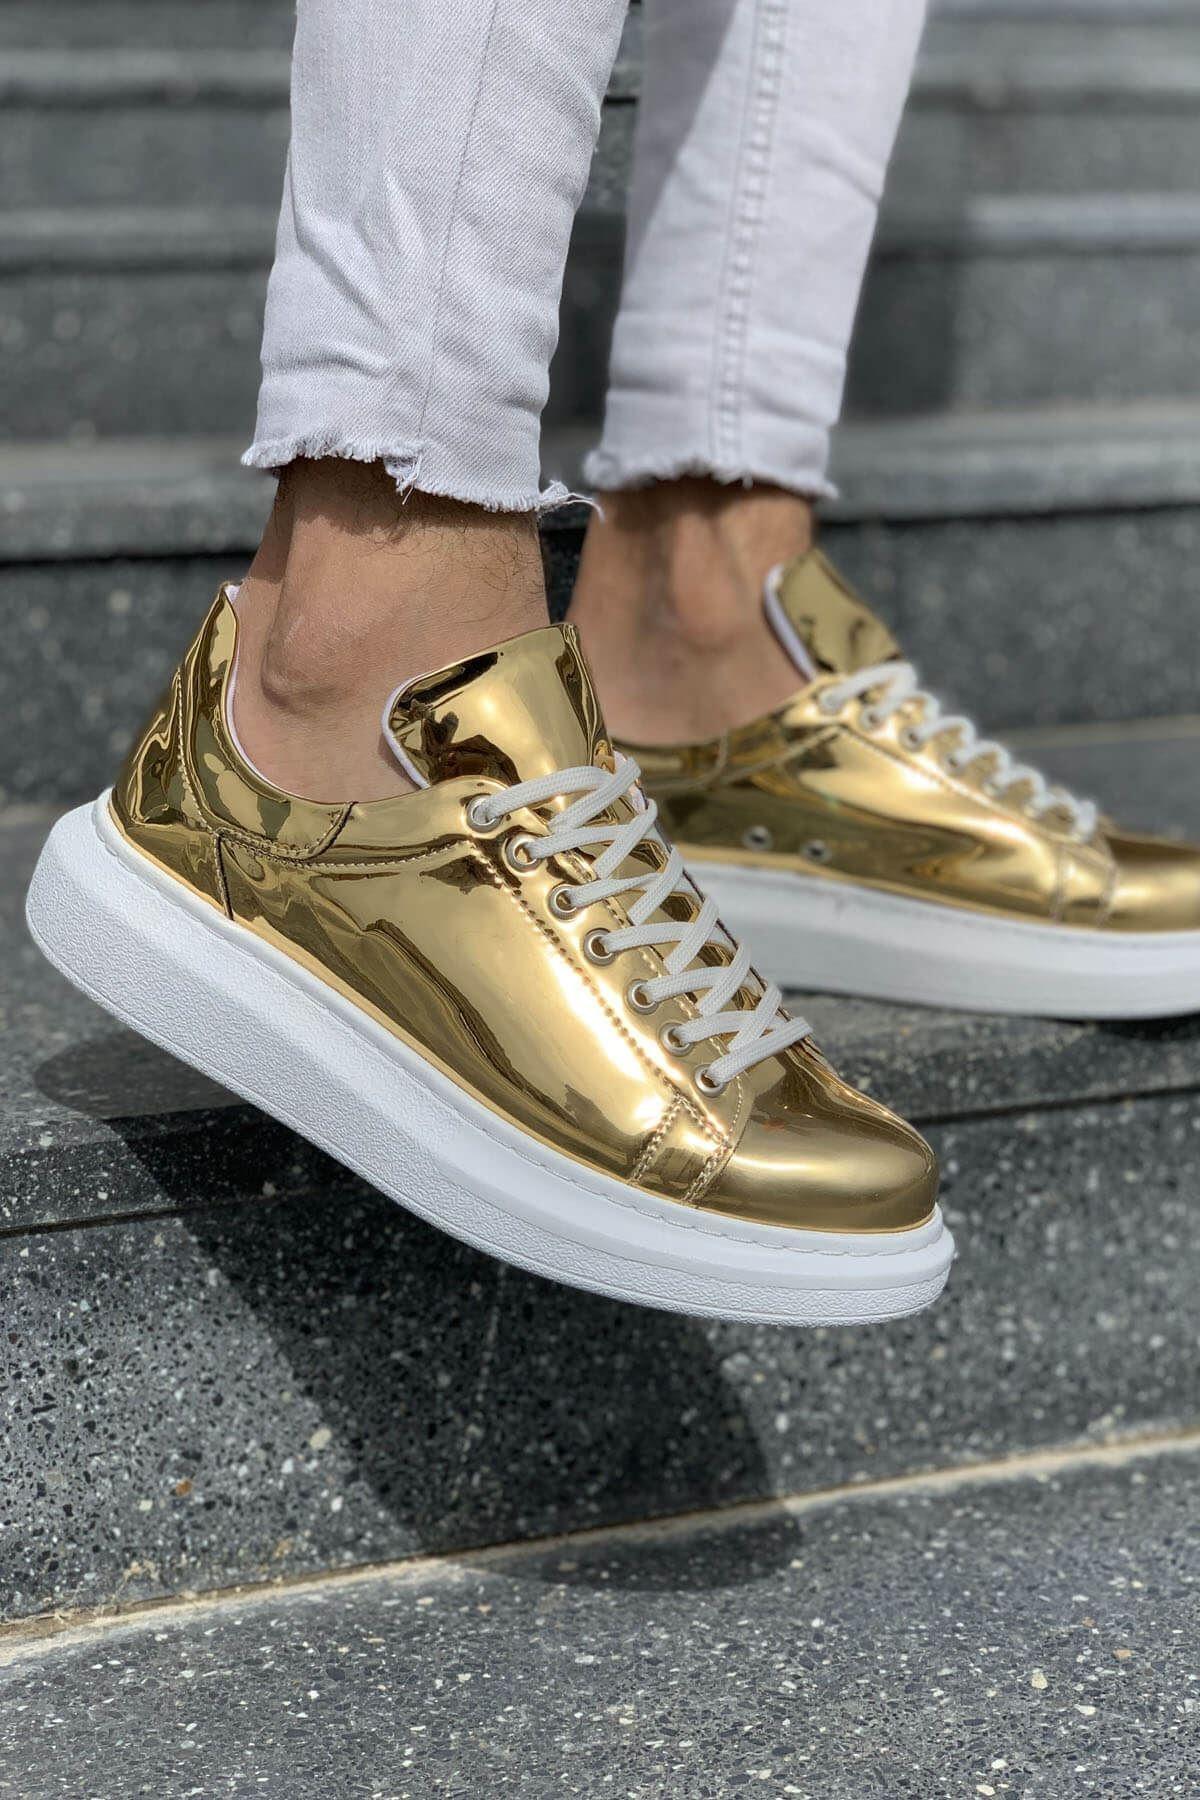 Chekich Ch Ch260 Bt Erkek Ayakkabı Altın 1